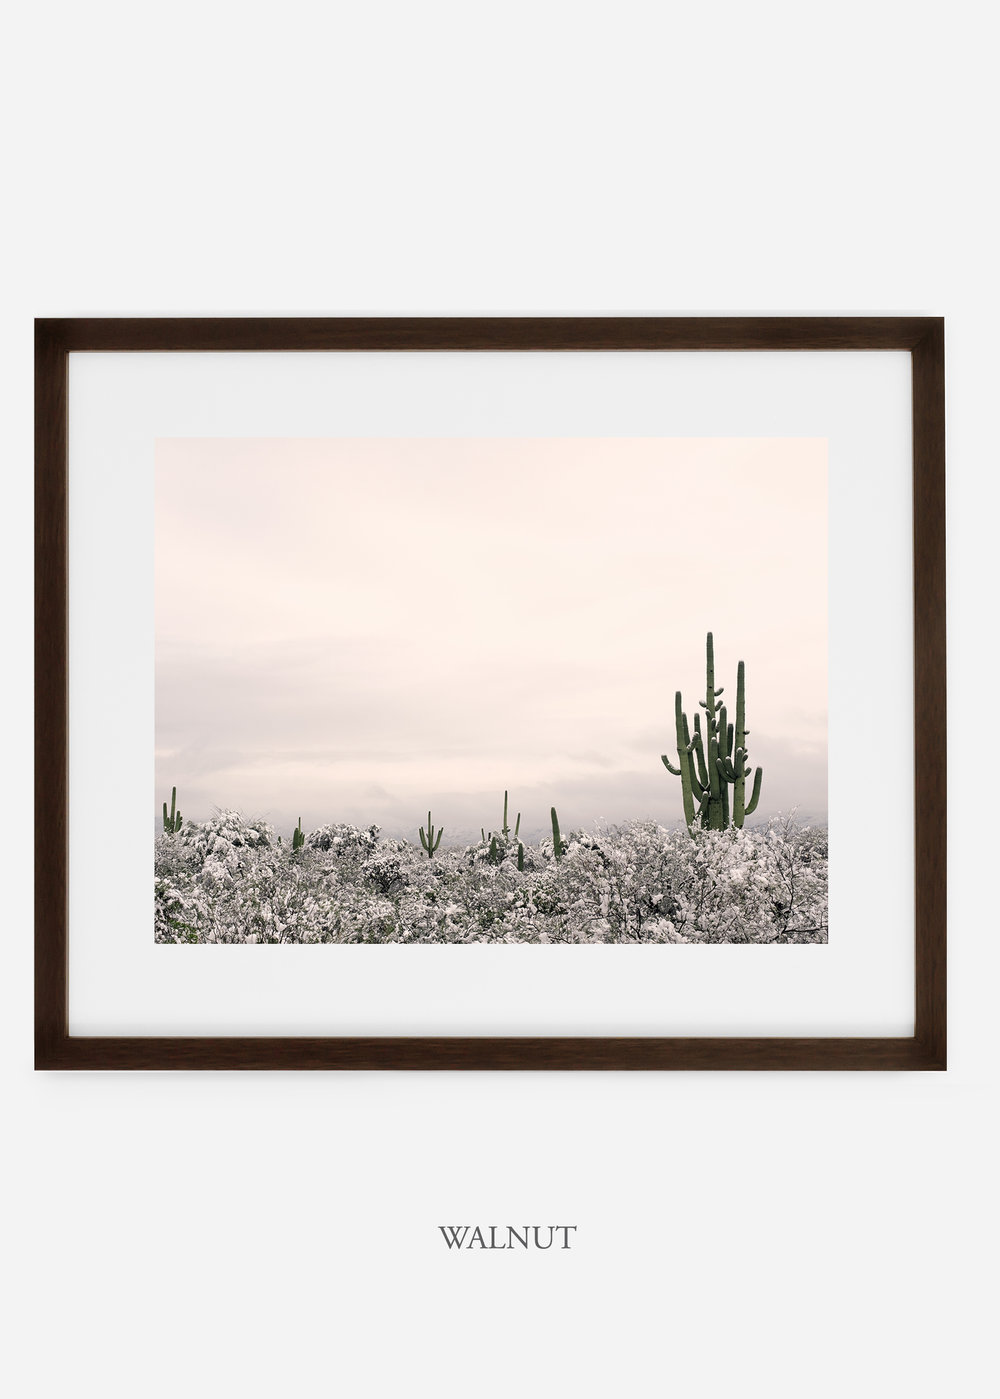 walnutframe-saguaroNo.7-wildercalifornia-art-wallart-cactusprint-homedecor-prints-arizona-botanical-artwork-interiordesign.jpg